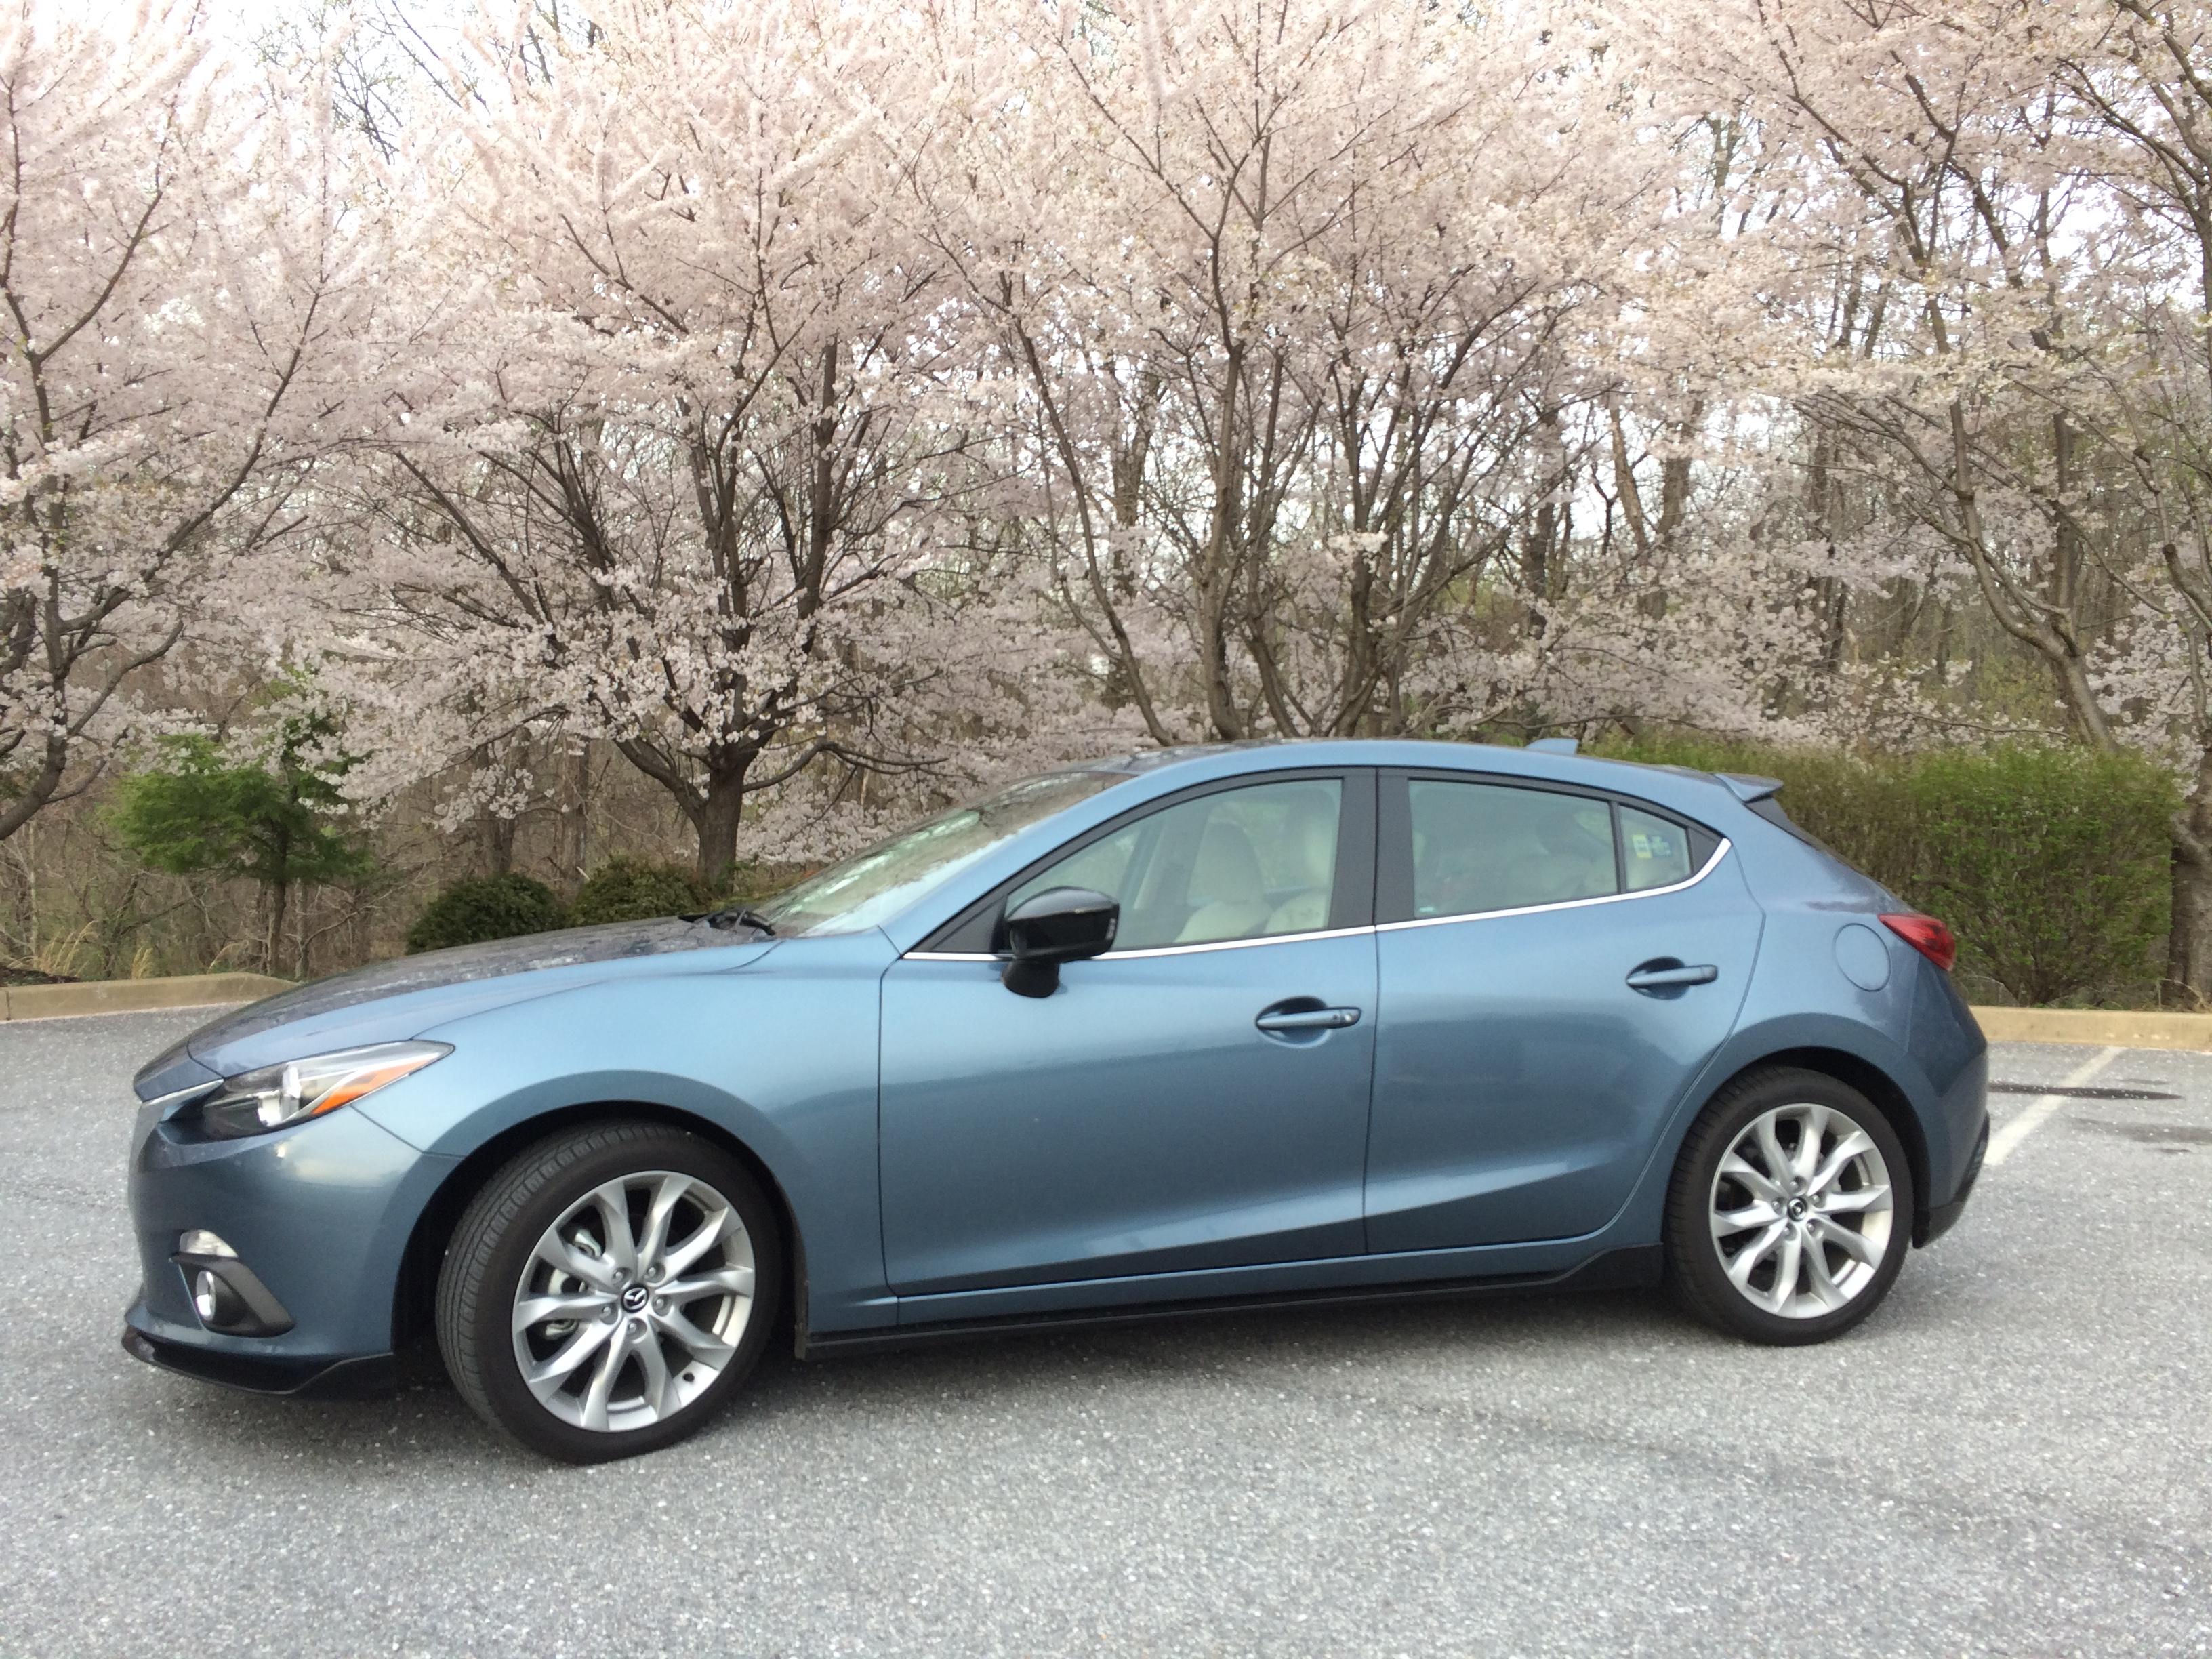 Mazda throws a manual in the 2015 Mazda3